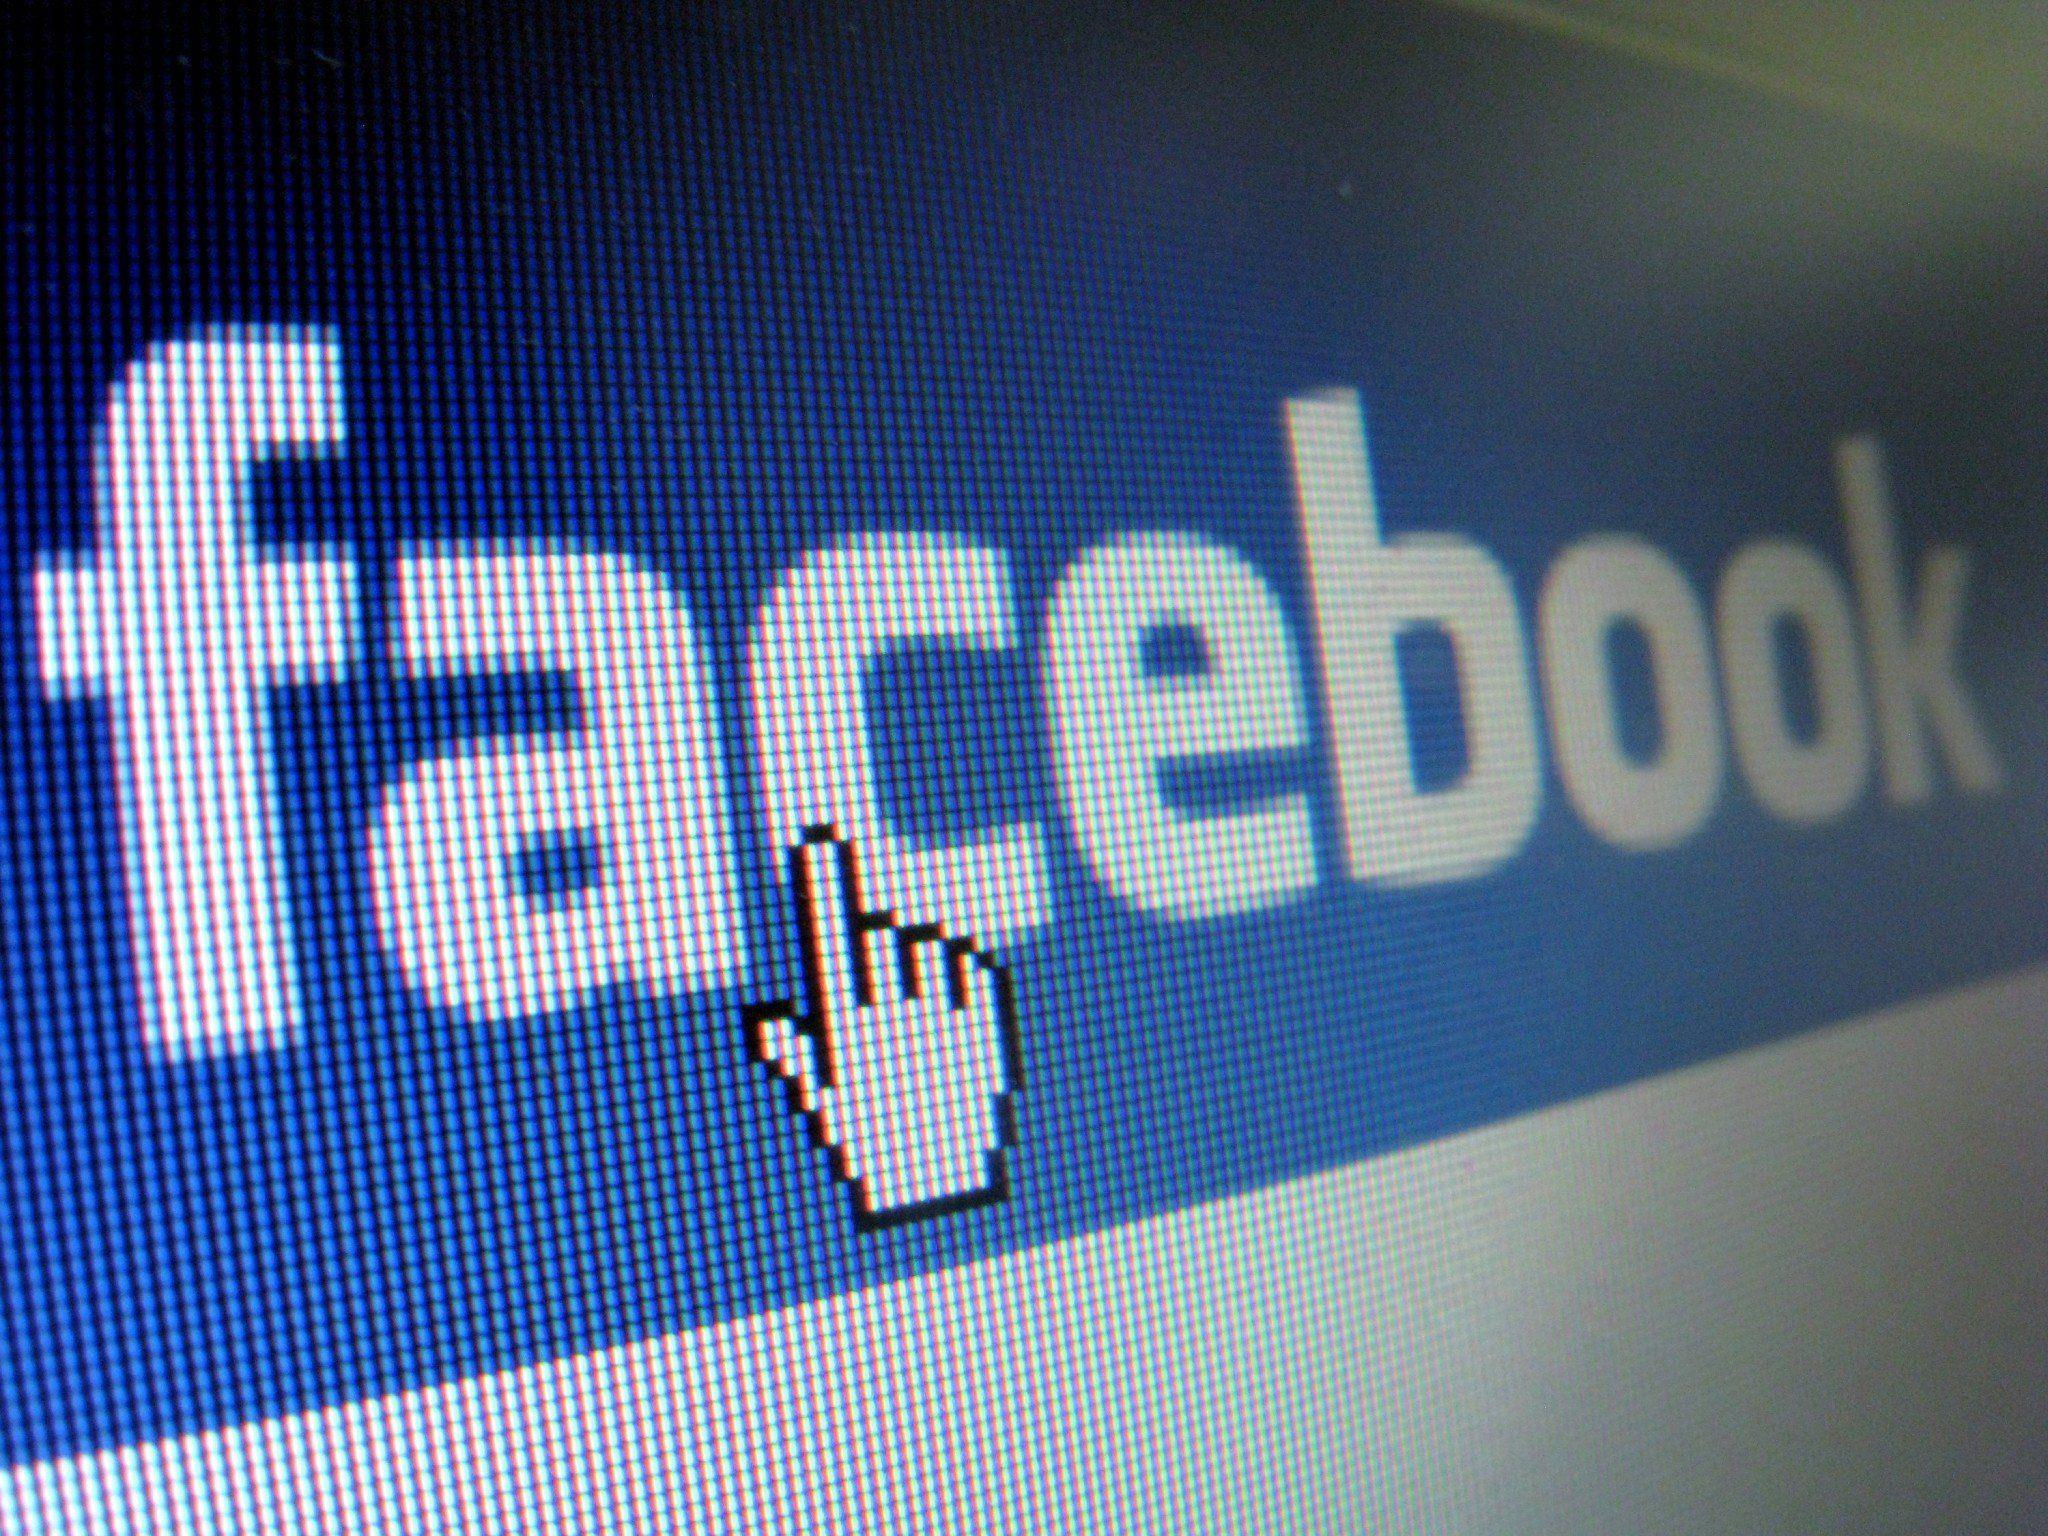 Überholt Facebook Google in Sachen Verlinkung langsam?